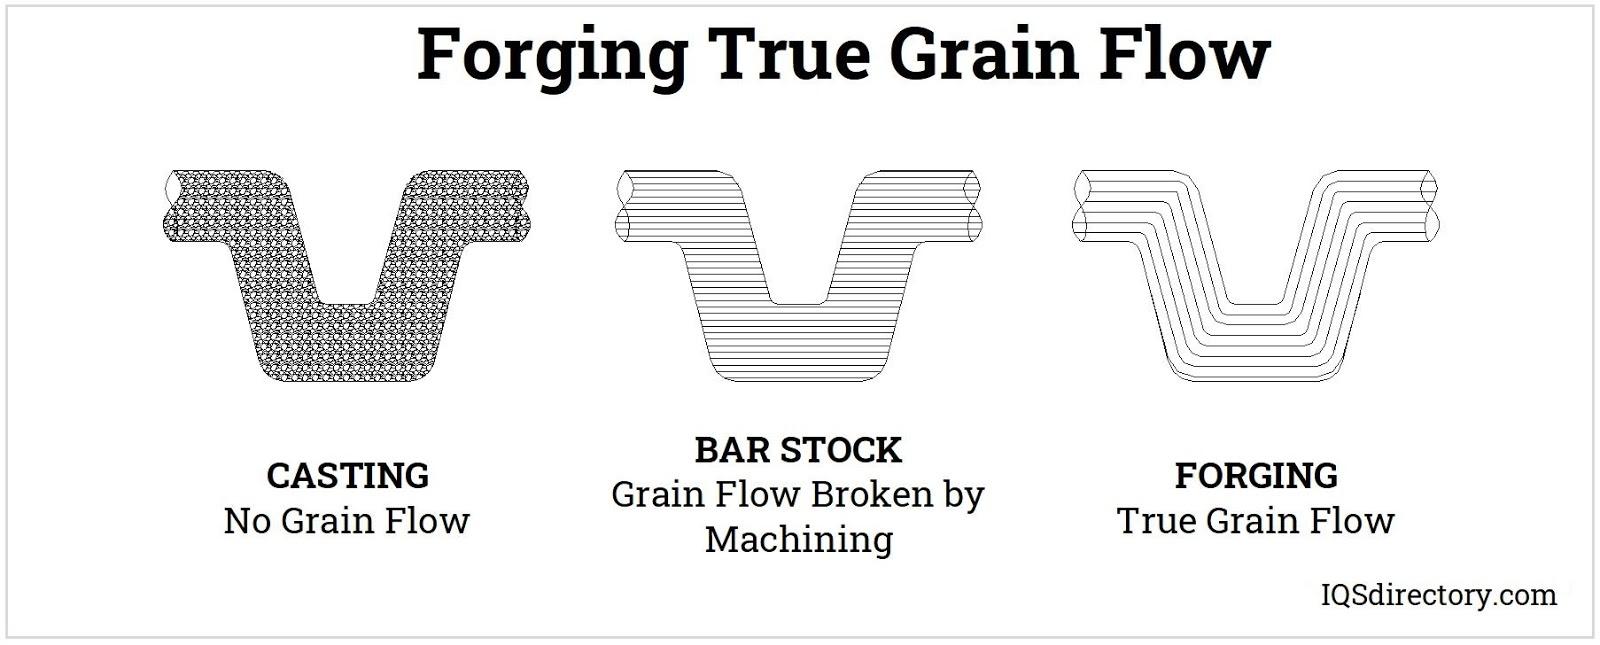 Forging True Grain Flow